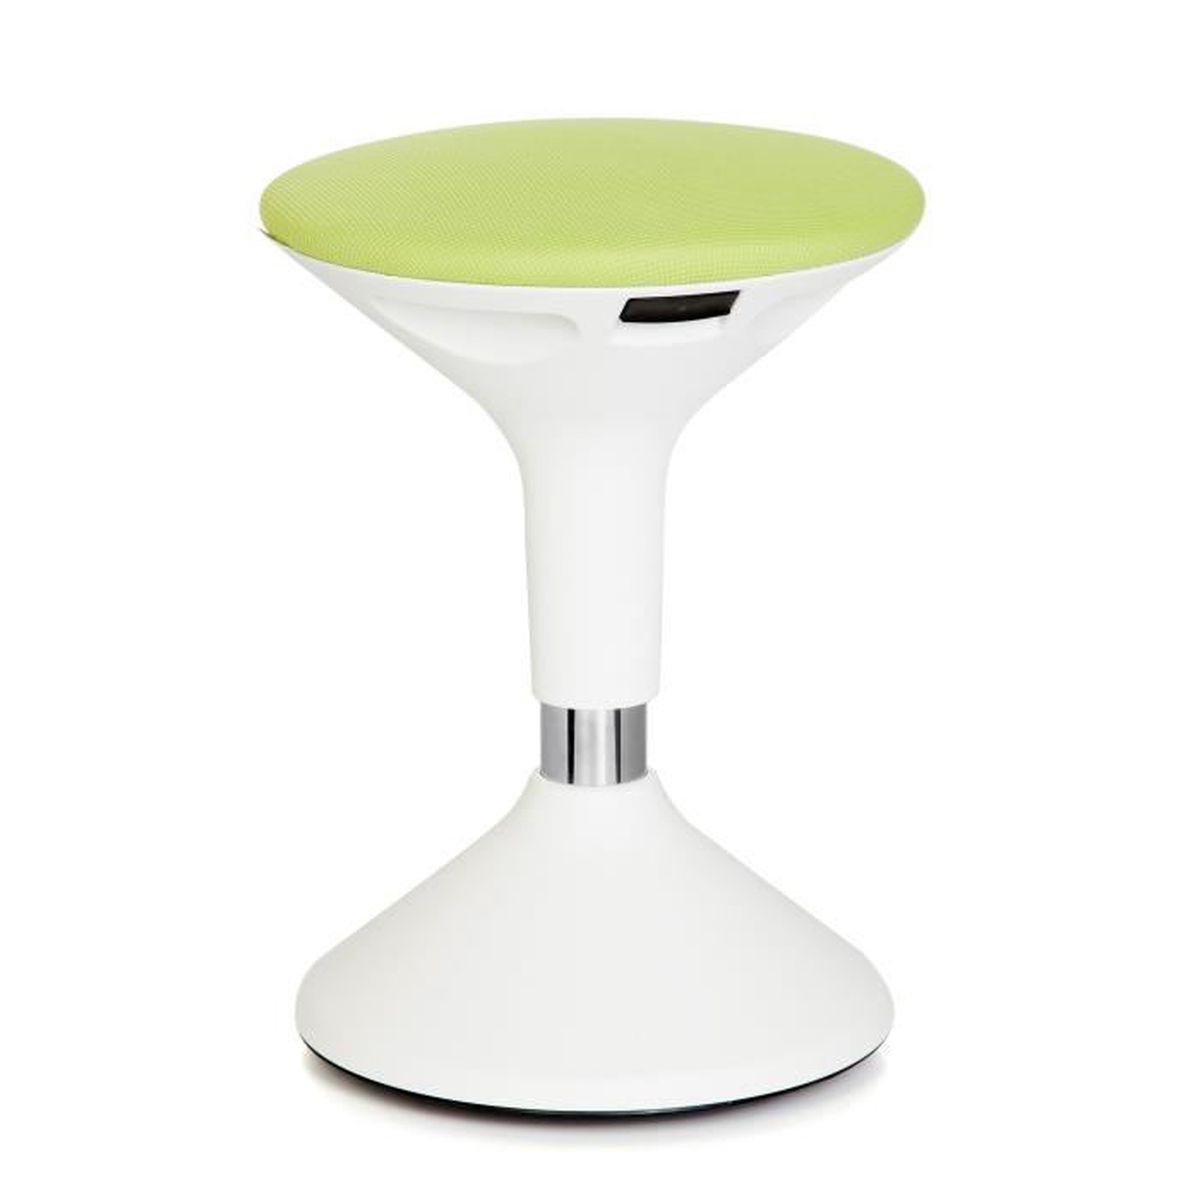 tabouret tabouret de travail sammy r glable en hauteur plastique blanc vert hjh office. Black Bedroom Furniture Sets. Home Design Ideas